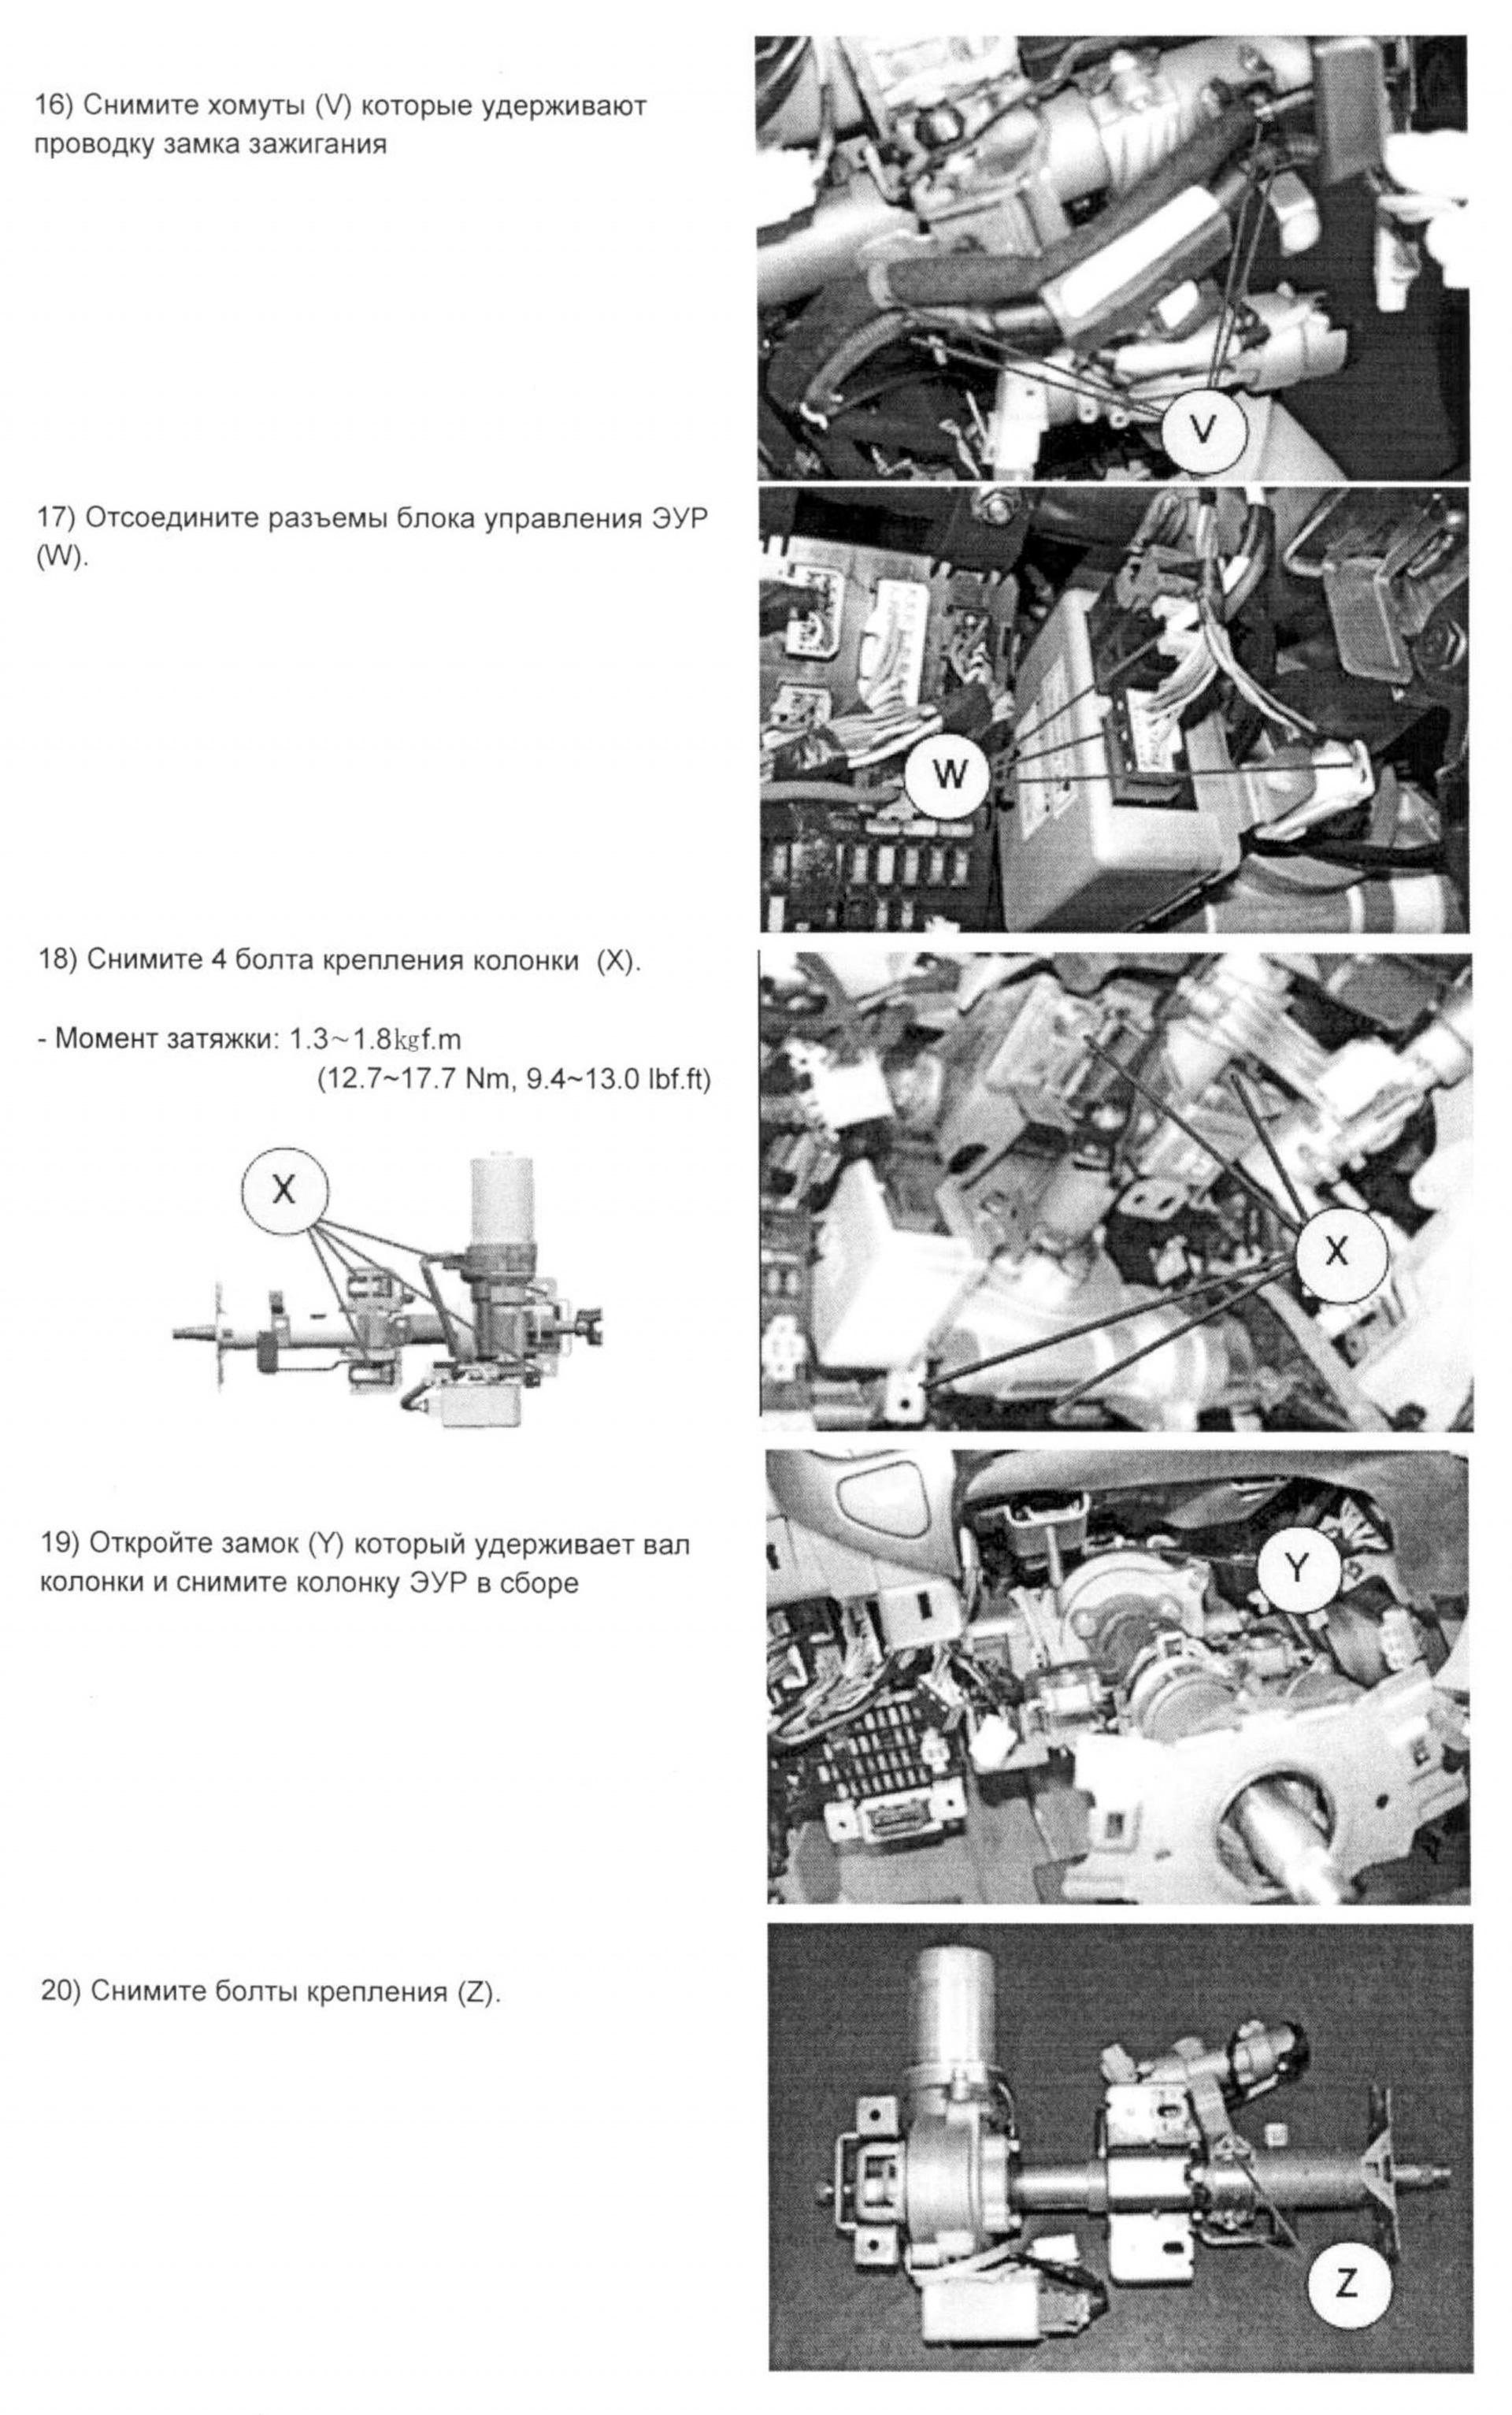 глюк электроусилителя руля (EPS) — бортжурнал Hyundai